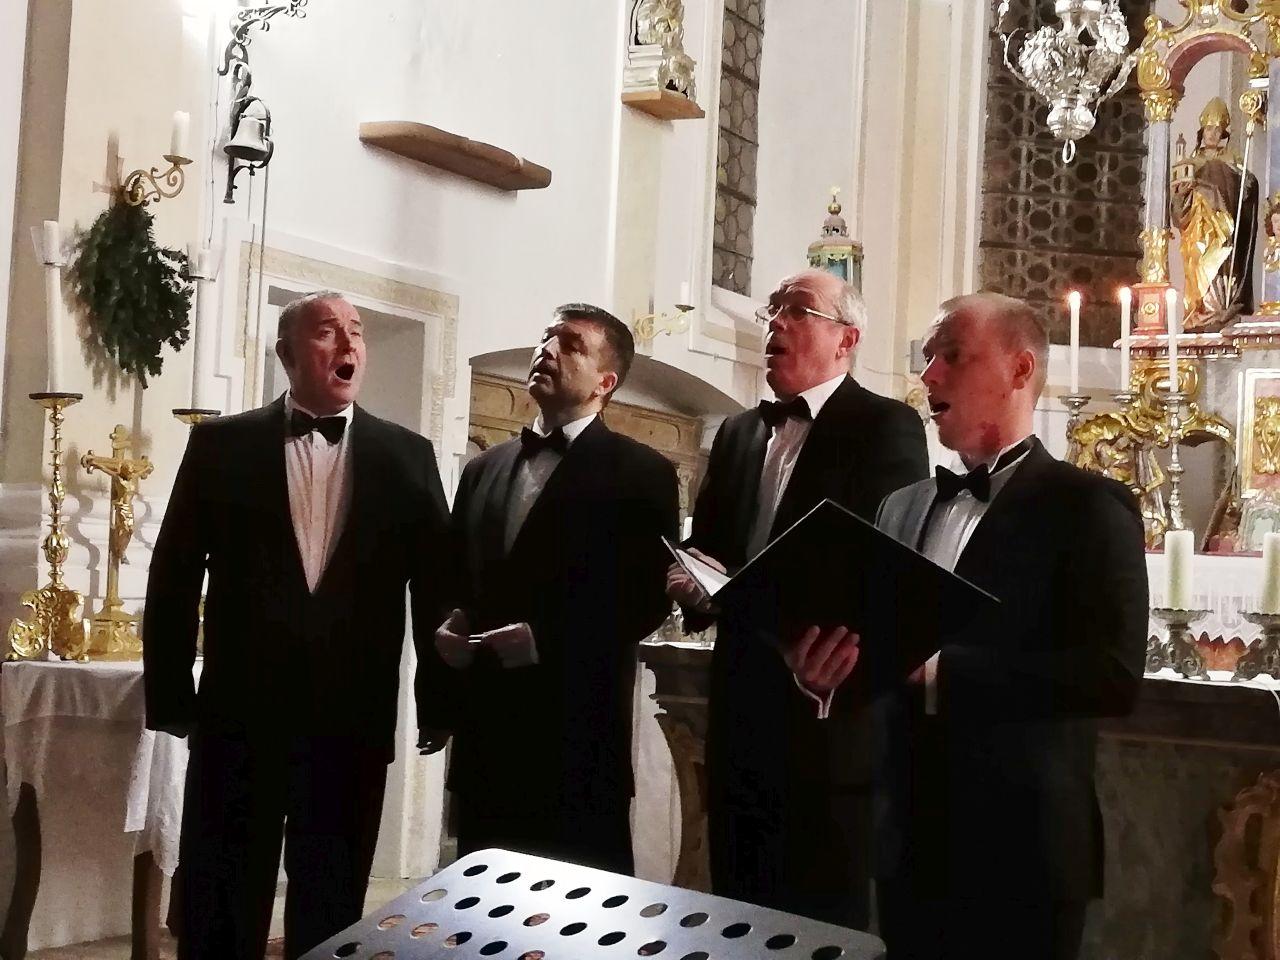 Das Peter's Quartett aus St. Petersburg